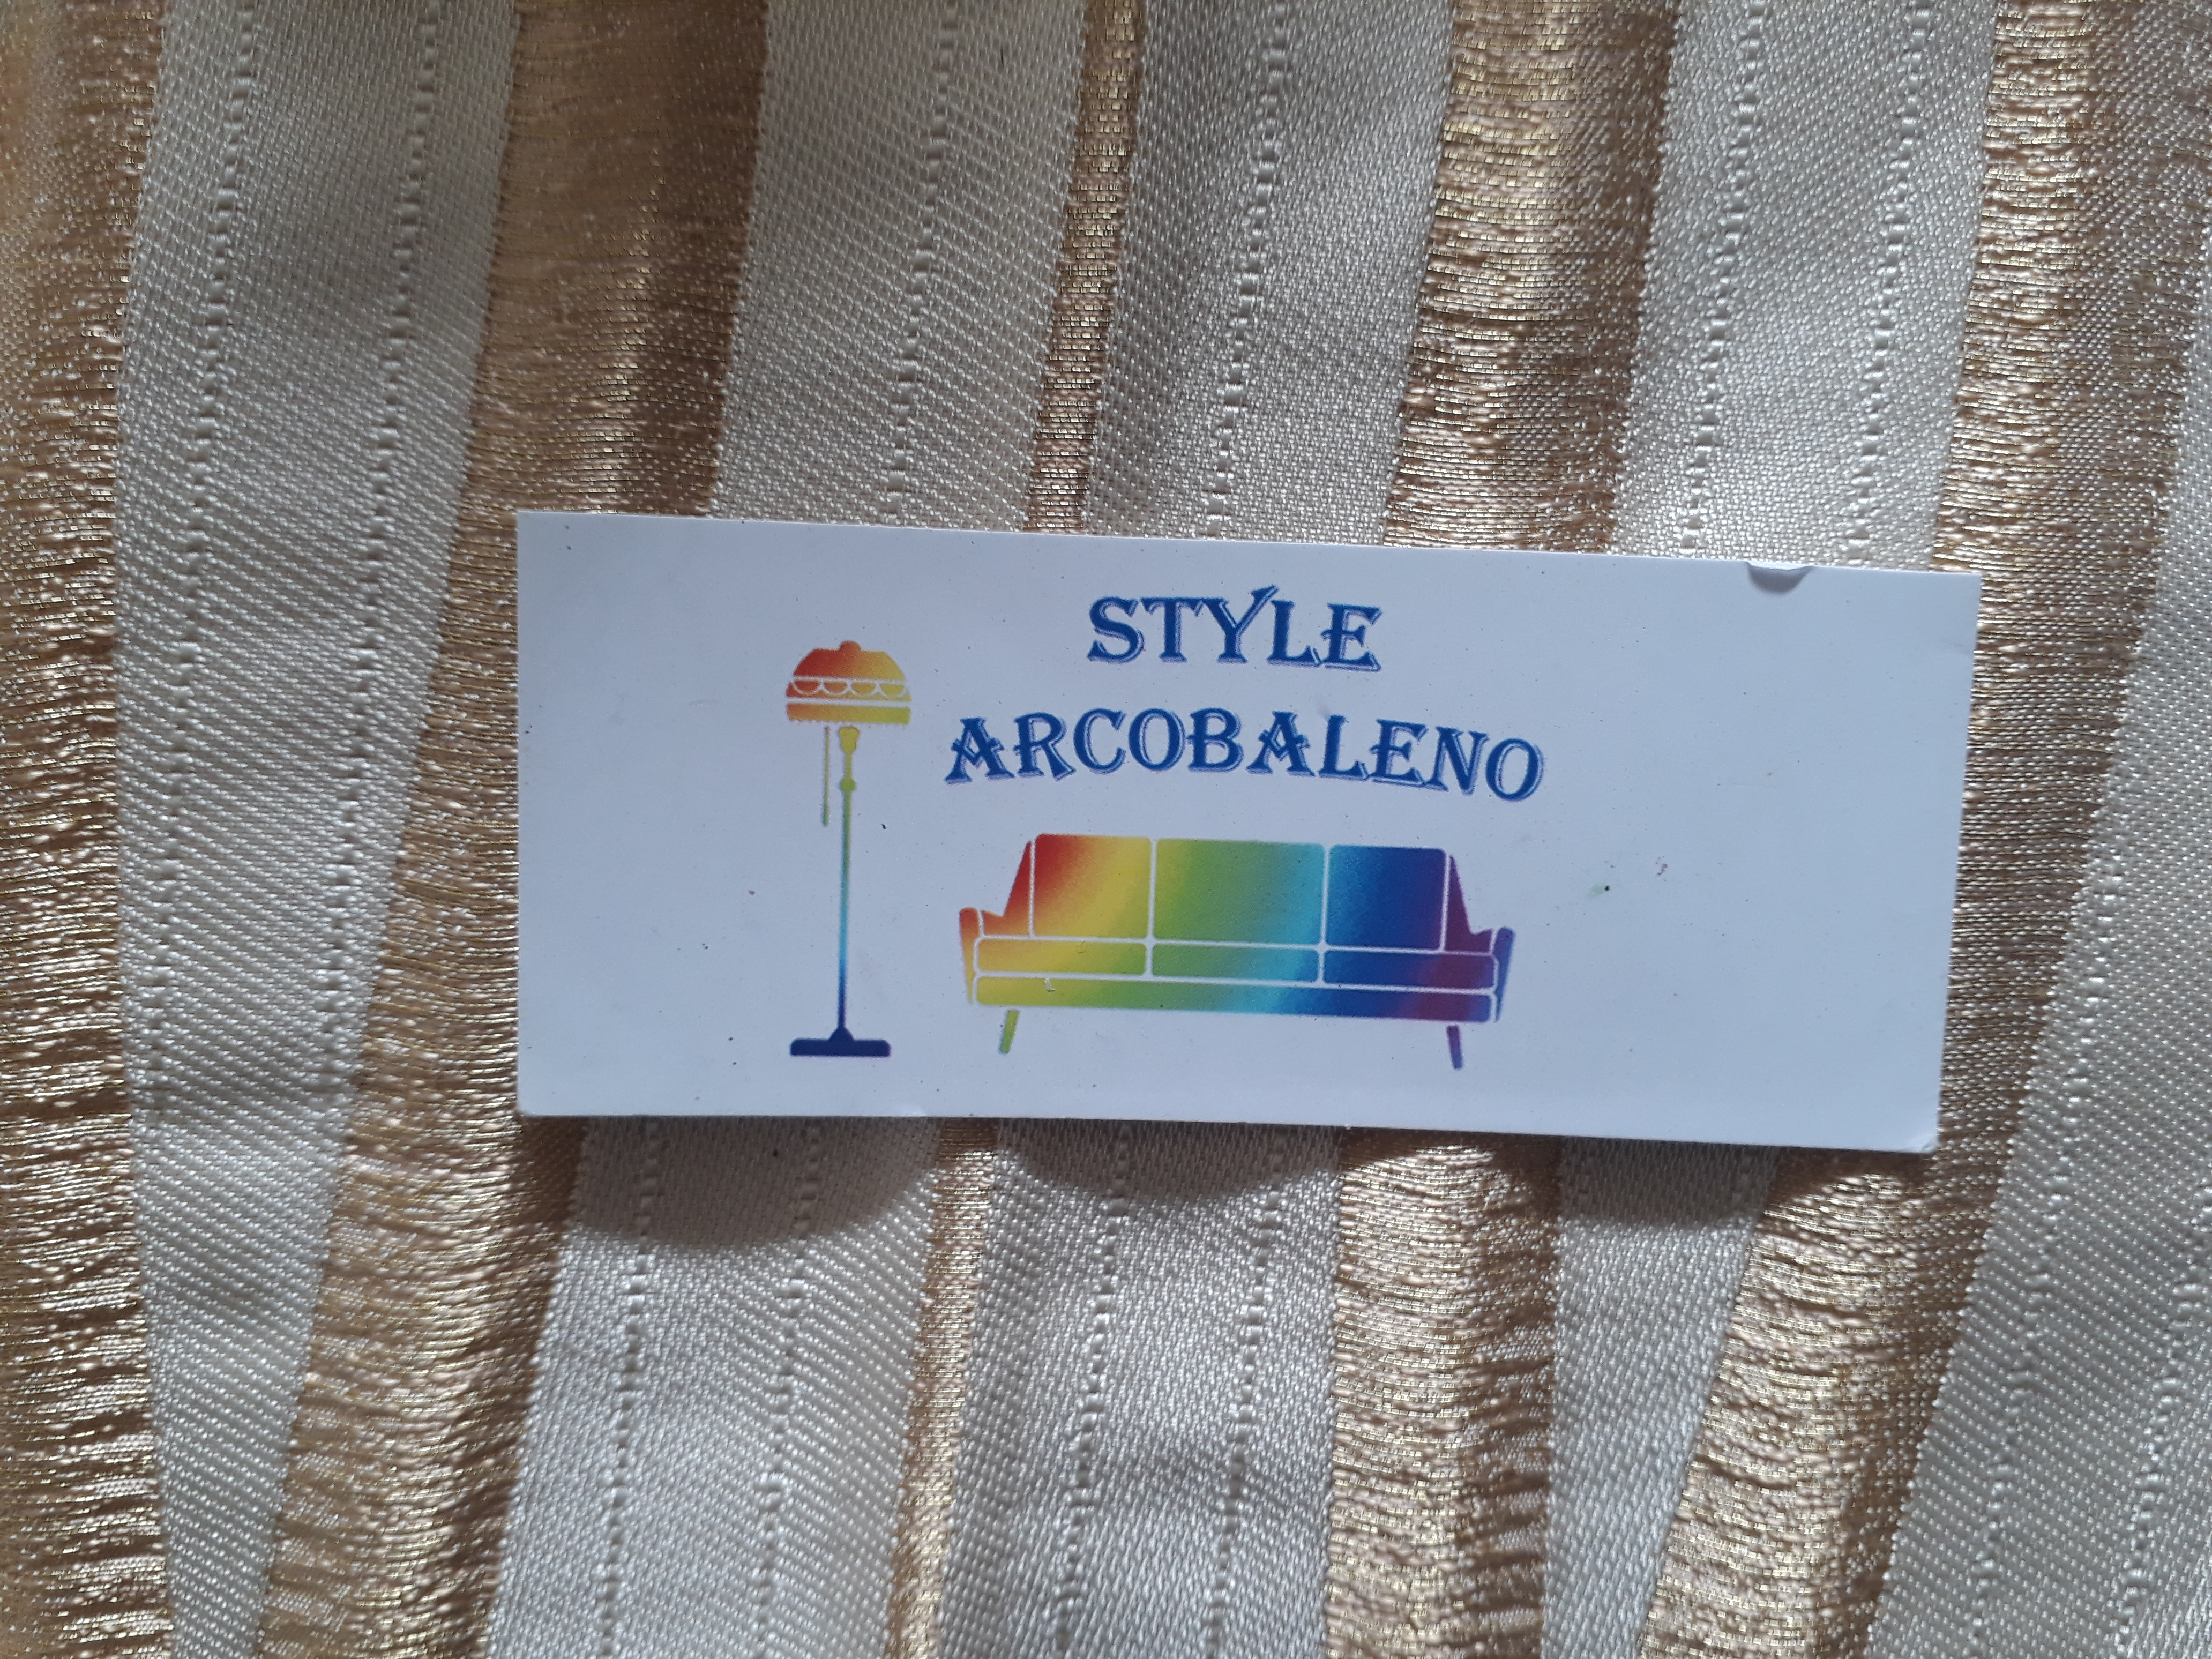 Style Arcobaleno